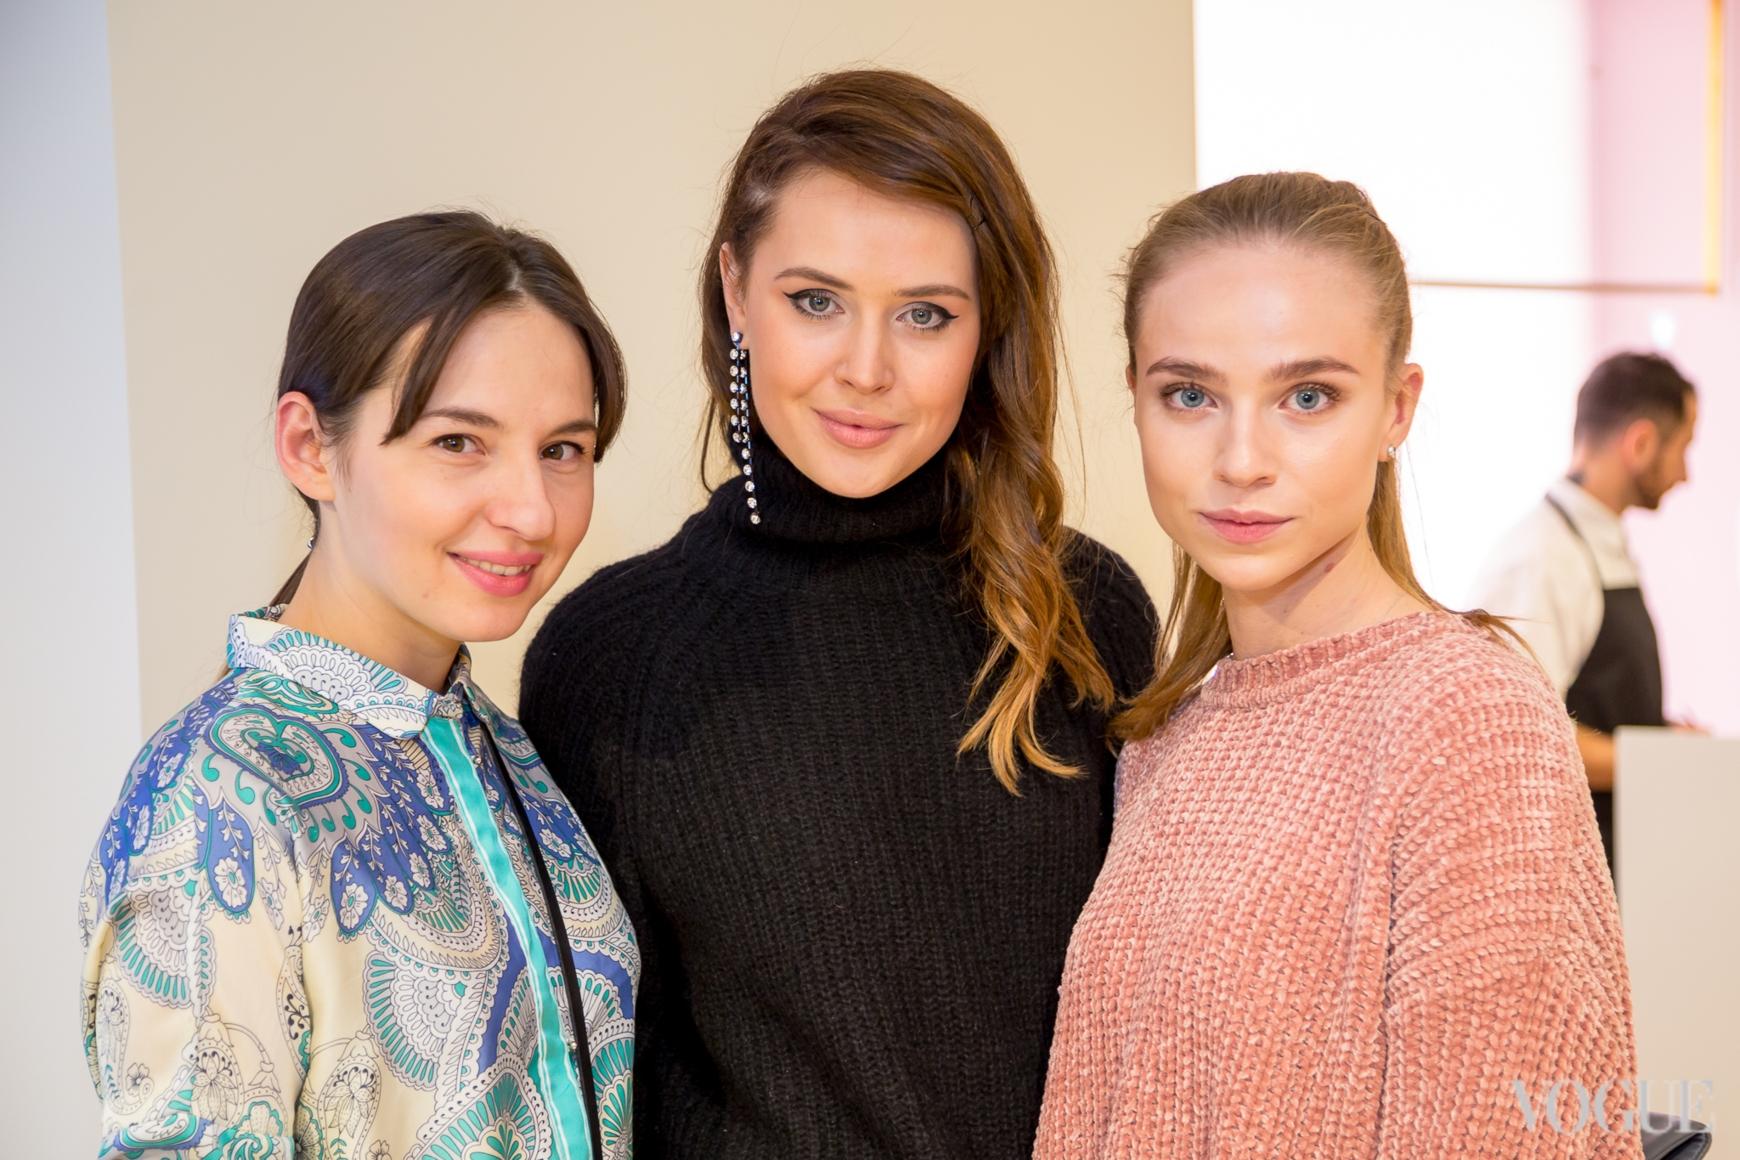 Виолетта Федорова, Катя Марьяш и Яна Дорошенко